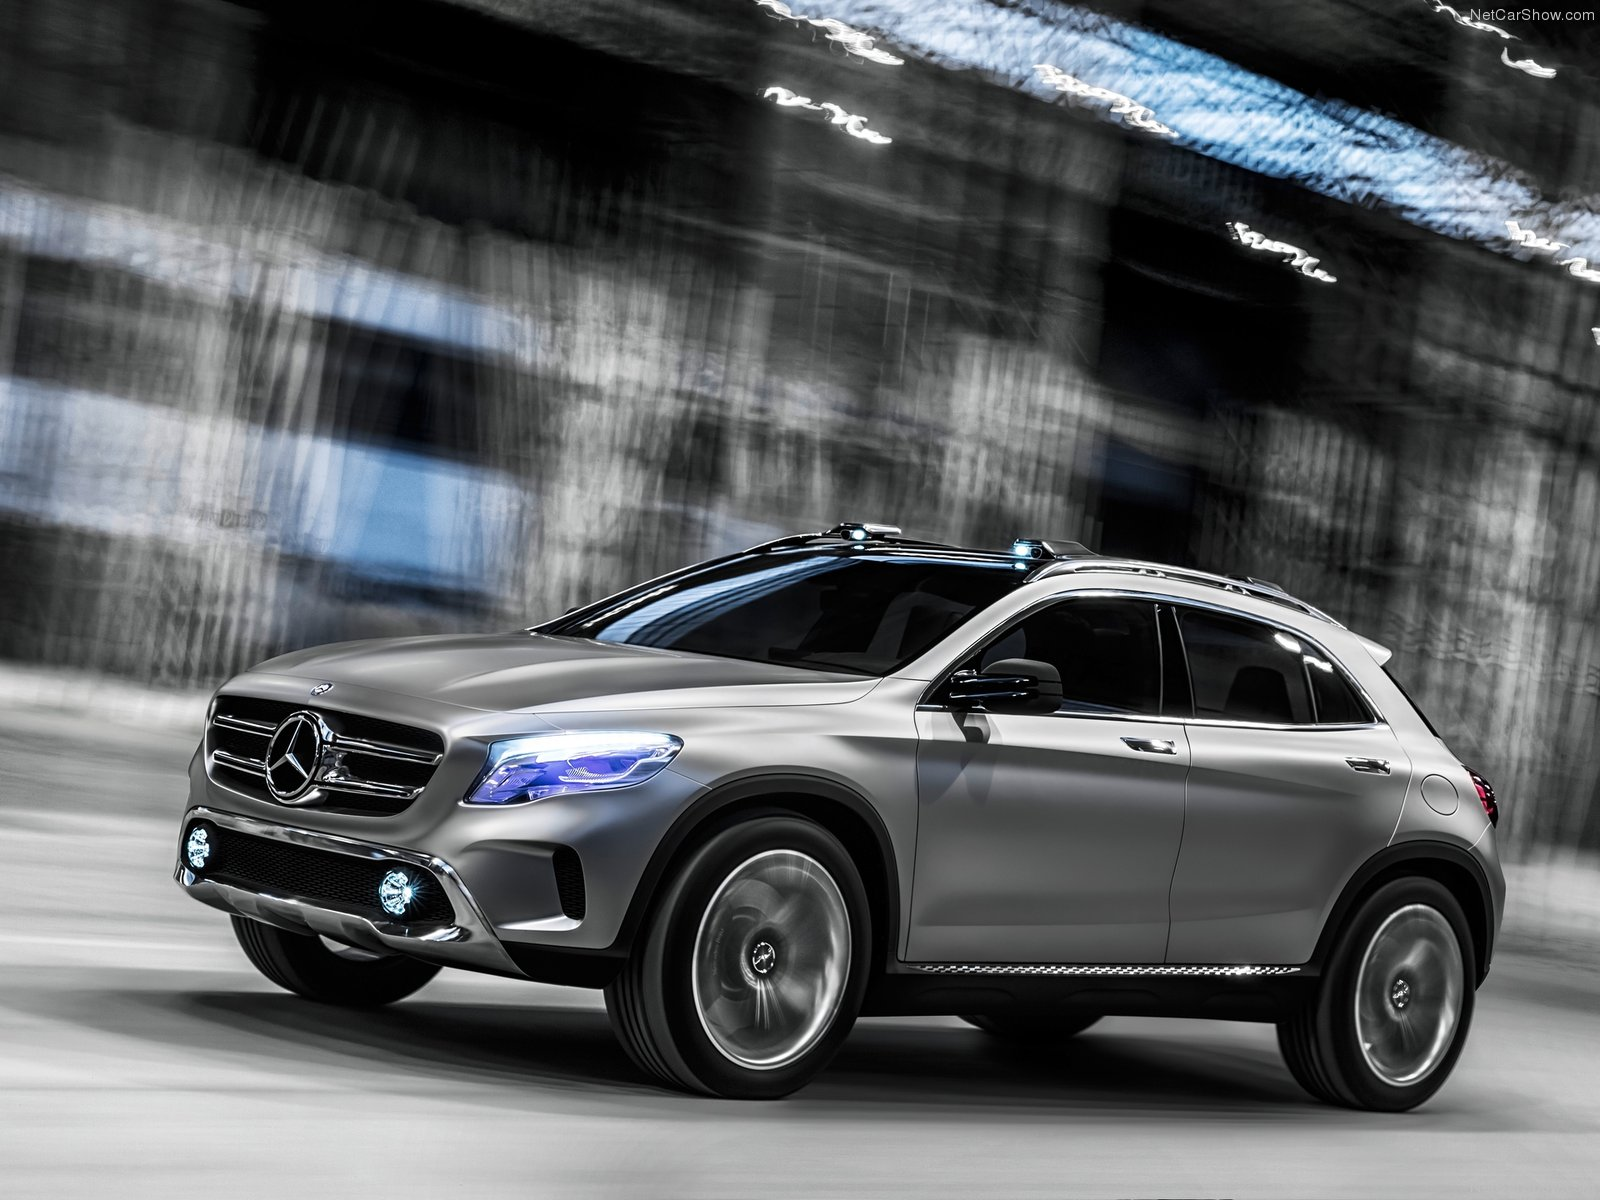 2013 mercedes benz gla concept mercedes benz for Mercedes benz gla 2014